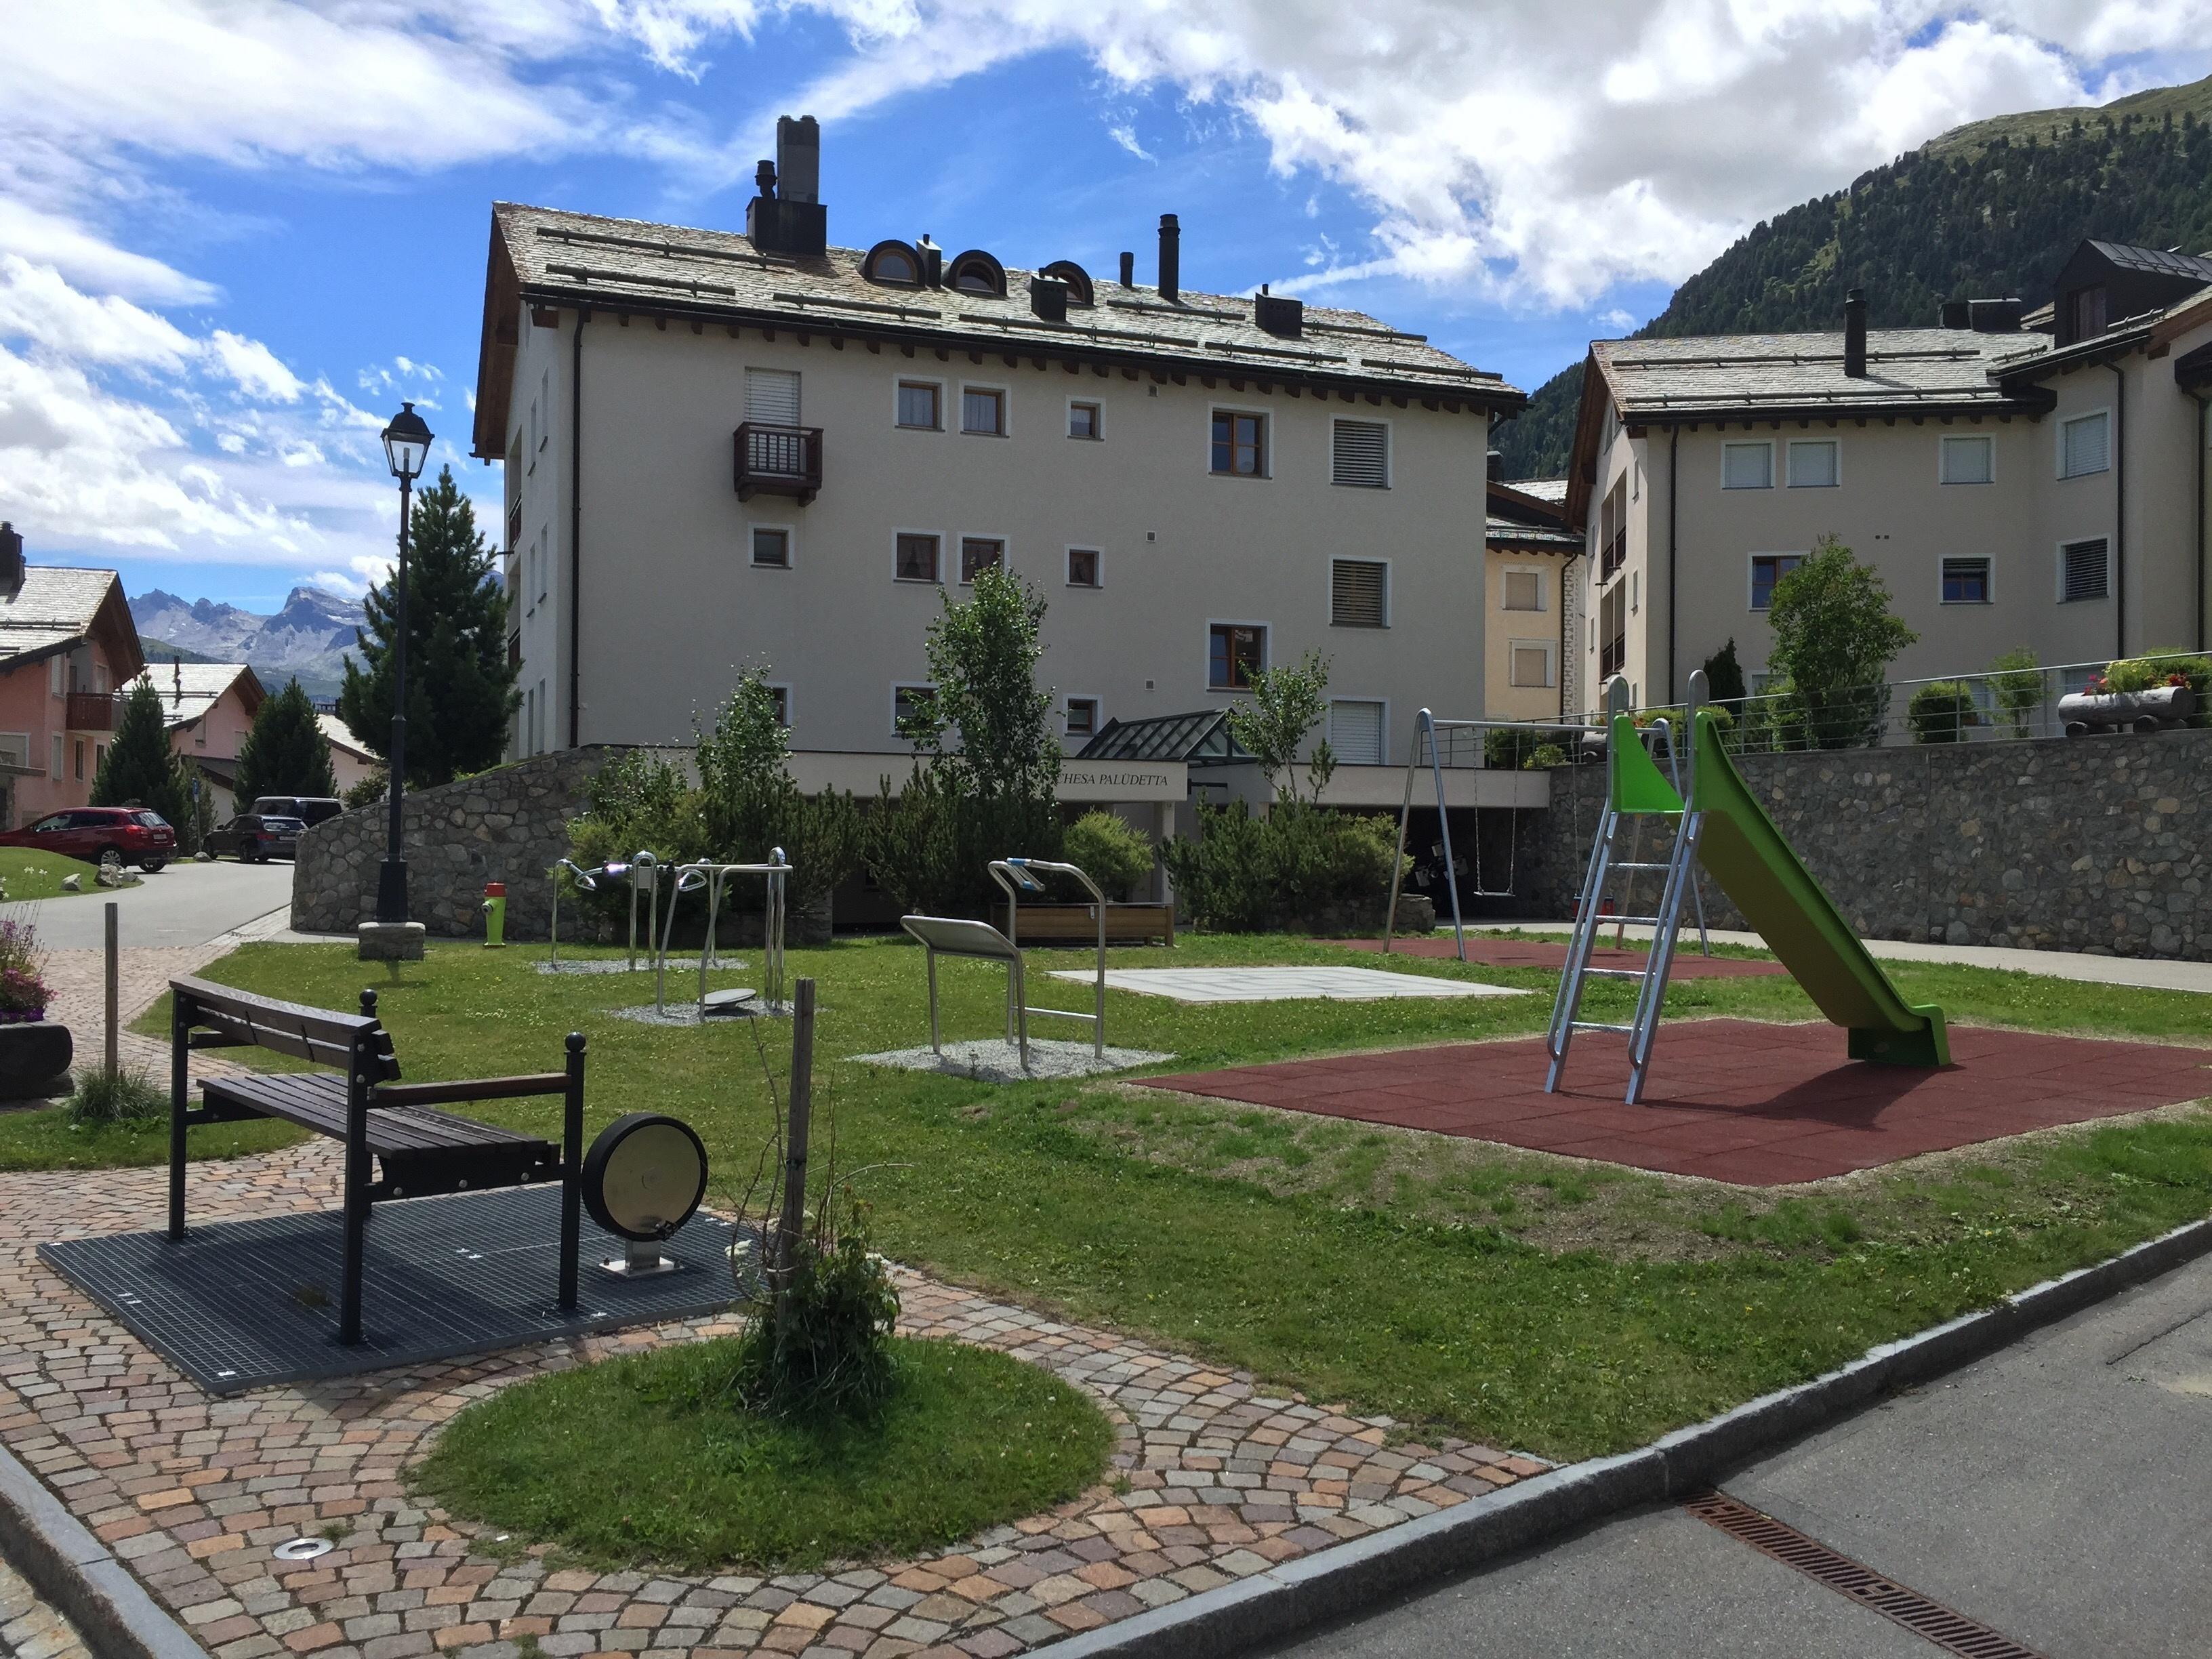 Alters- & Kinderspielplatz Via Munterots Slide 1